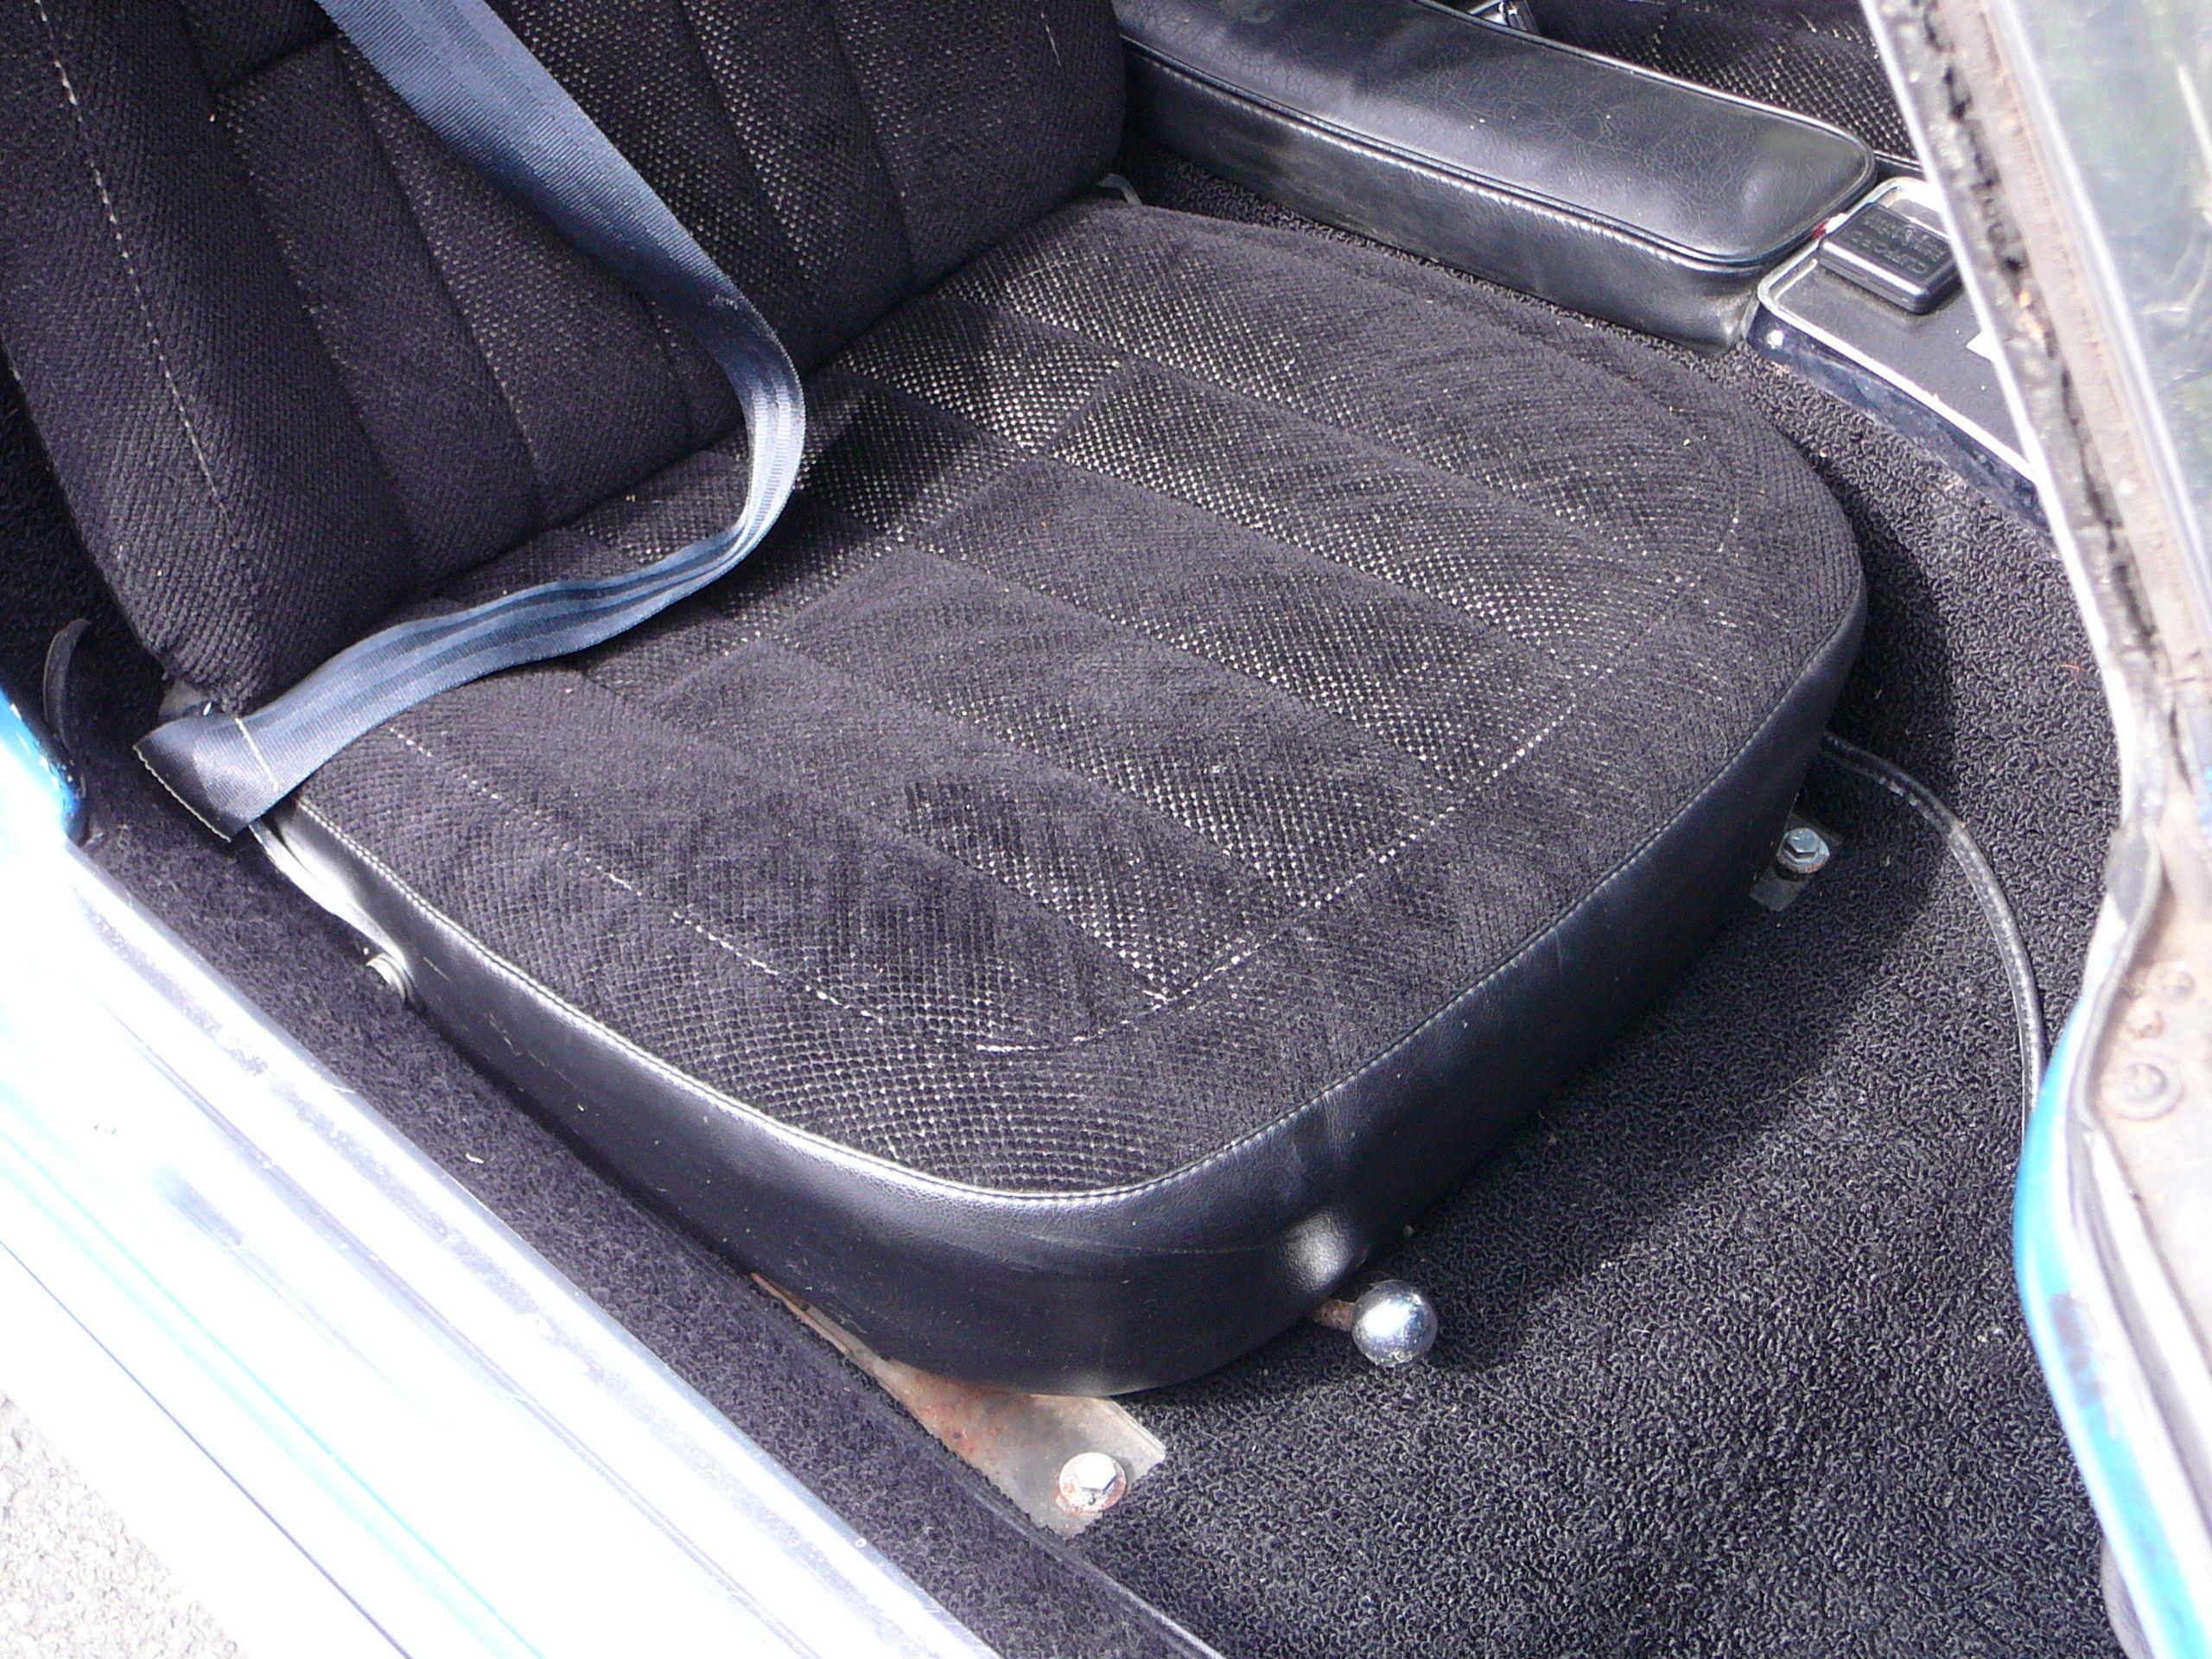 Passenger side seat close up